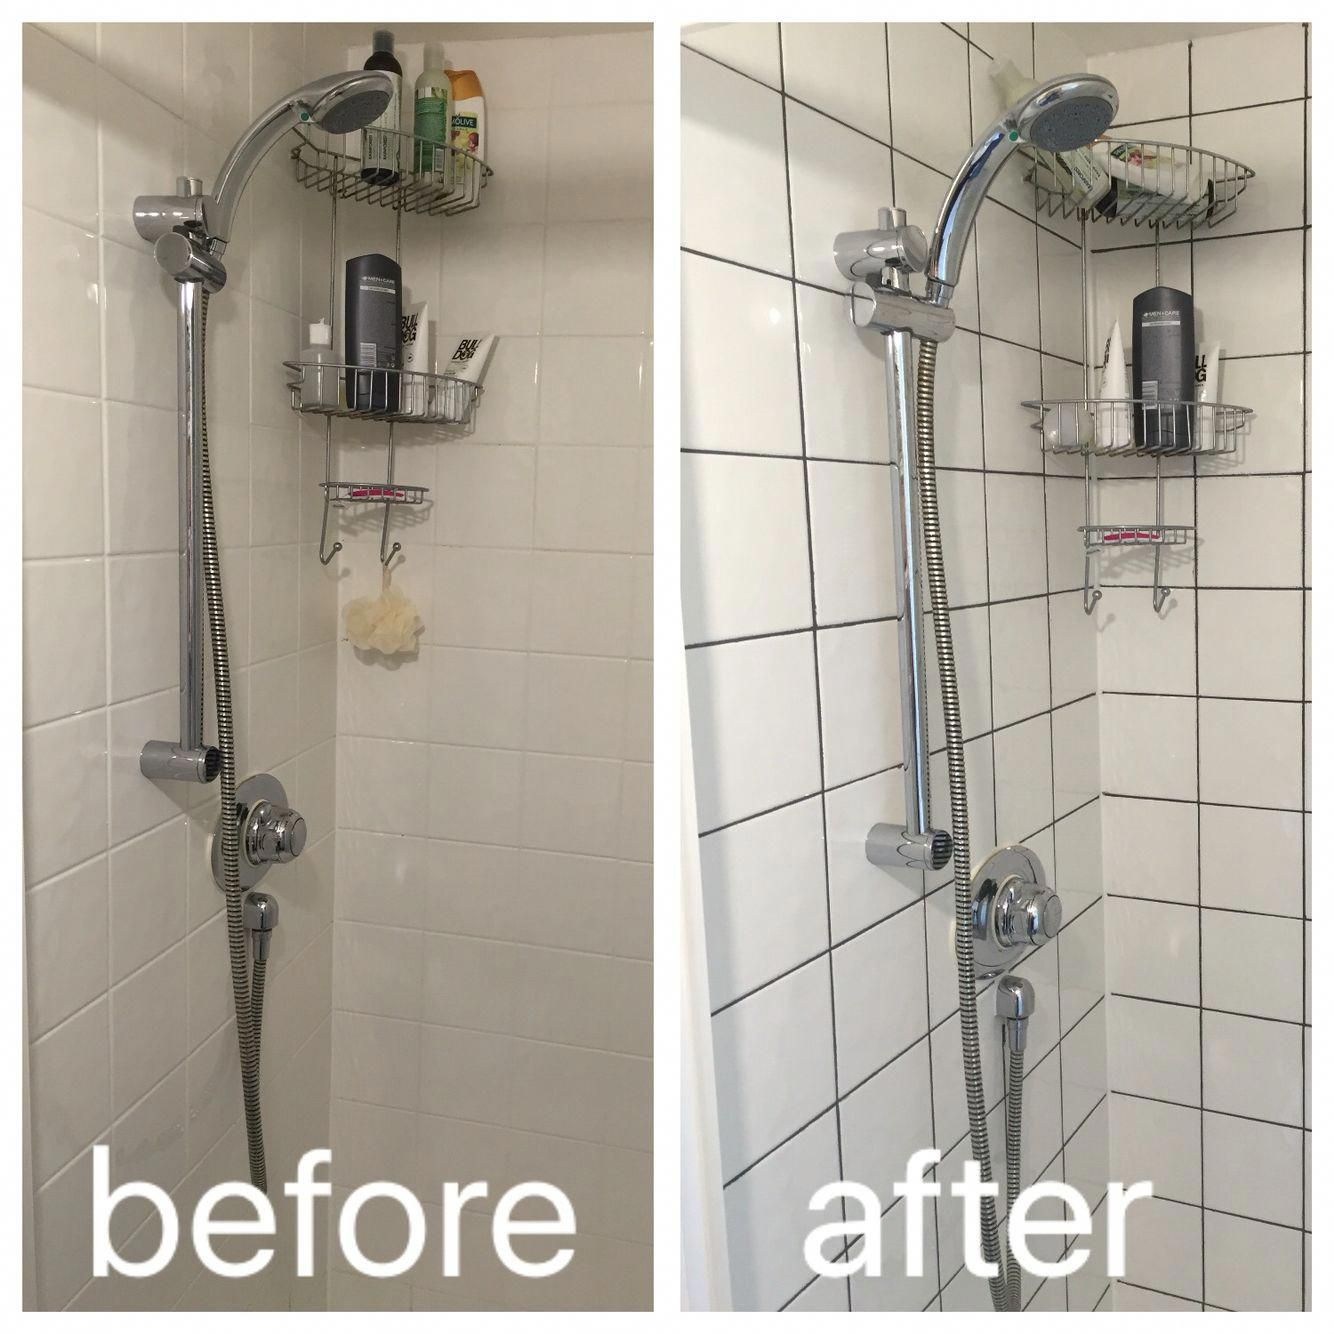 Diy Regrout Bathroom Tile